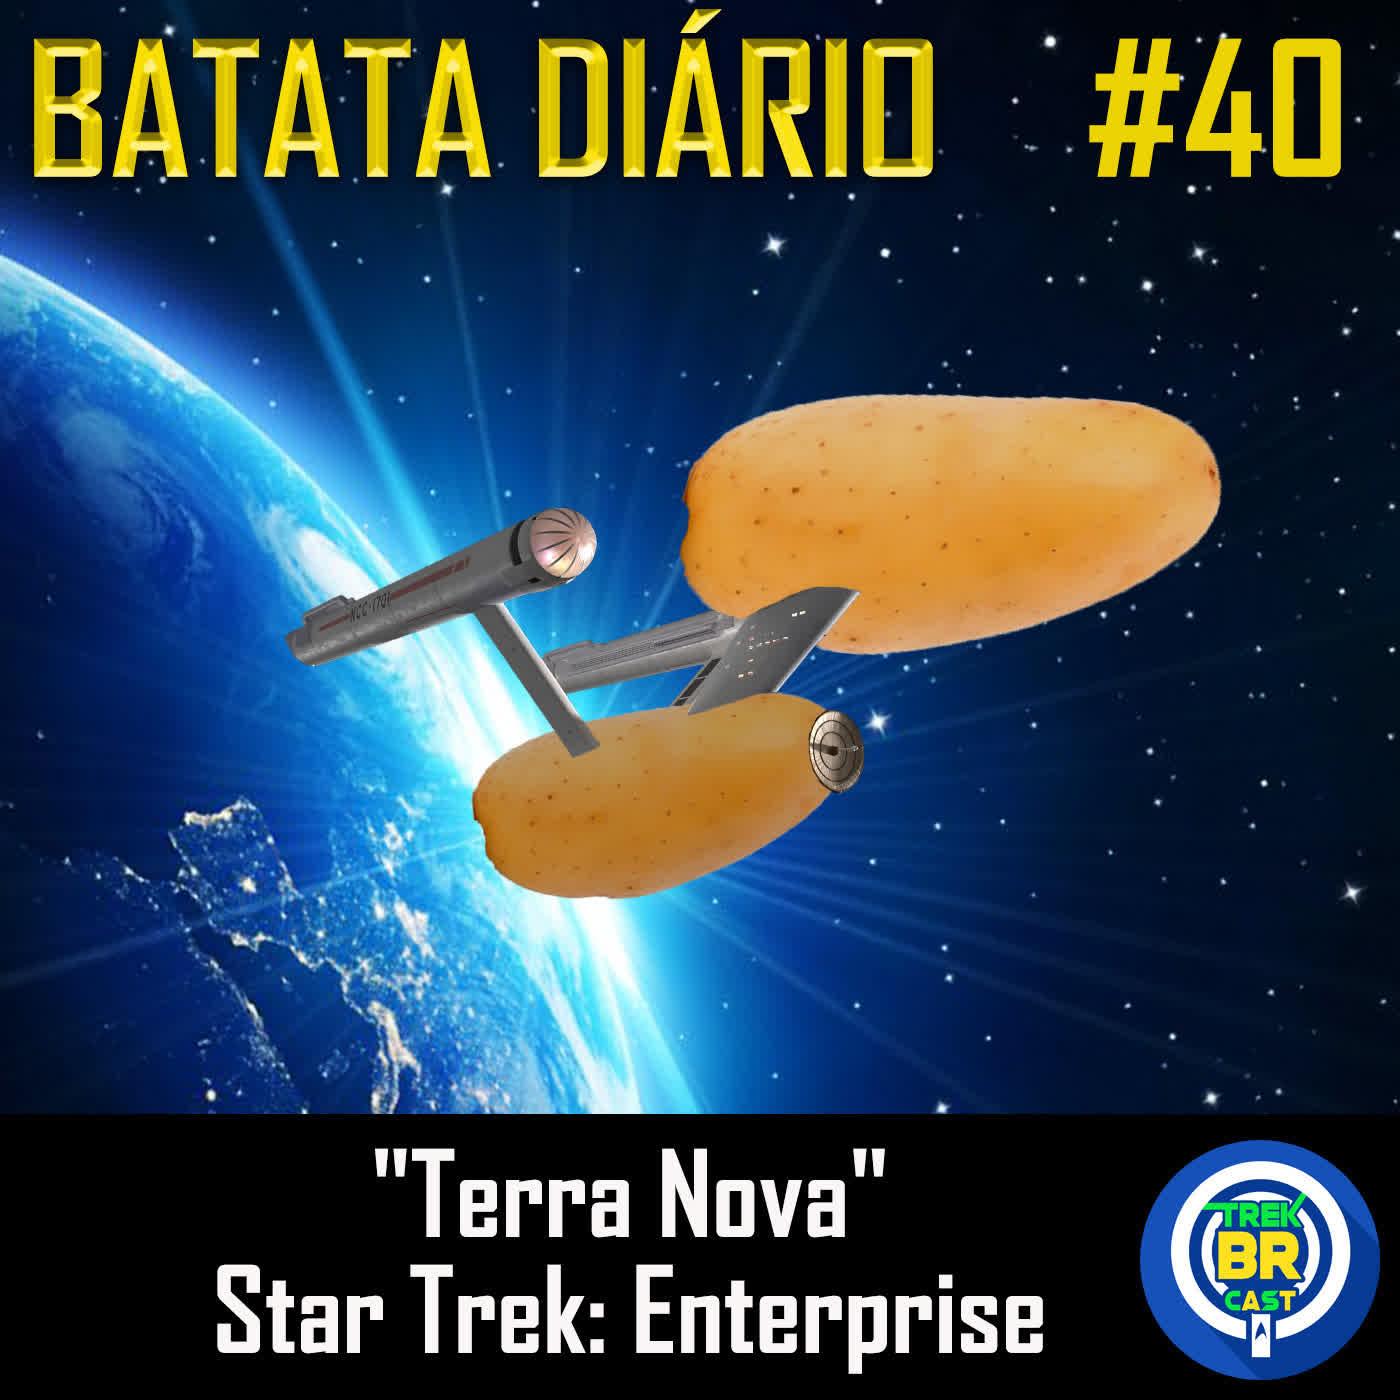 """Terra Nova"" Star Trek: Enterprise - Batata Diário Ep87"